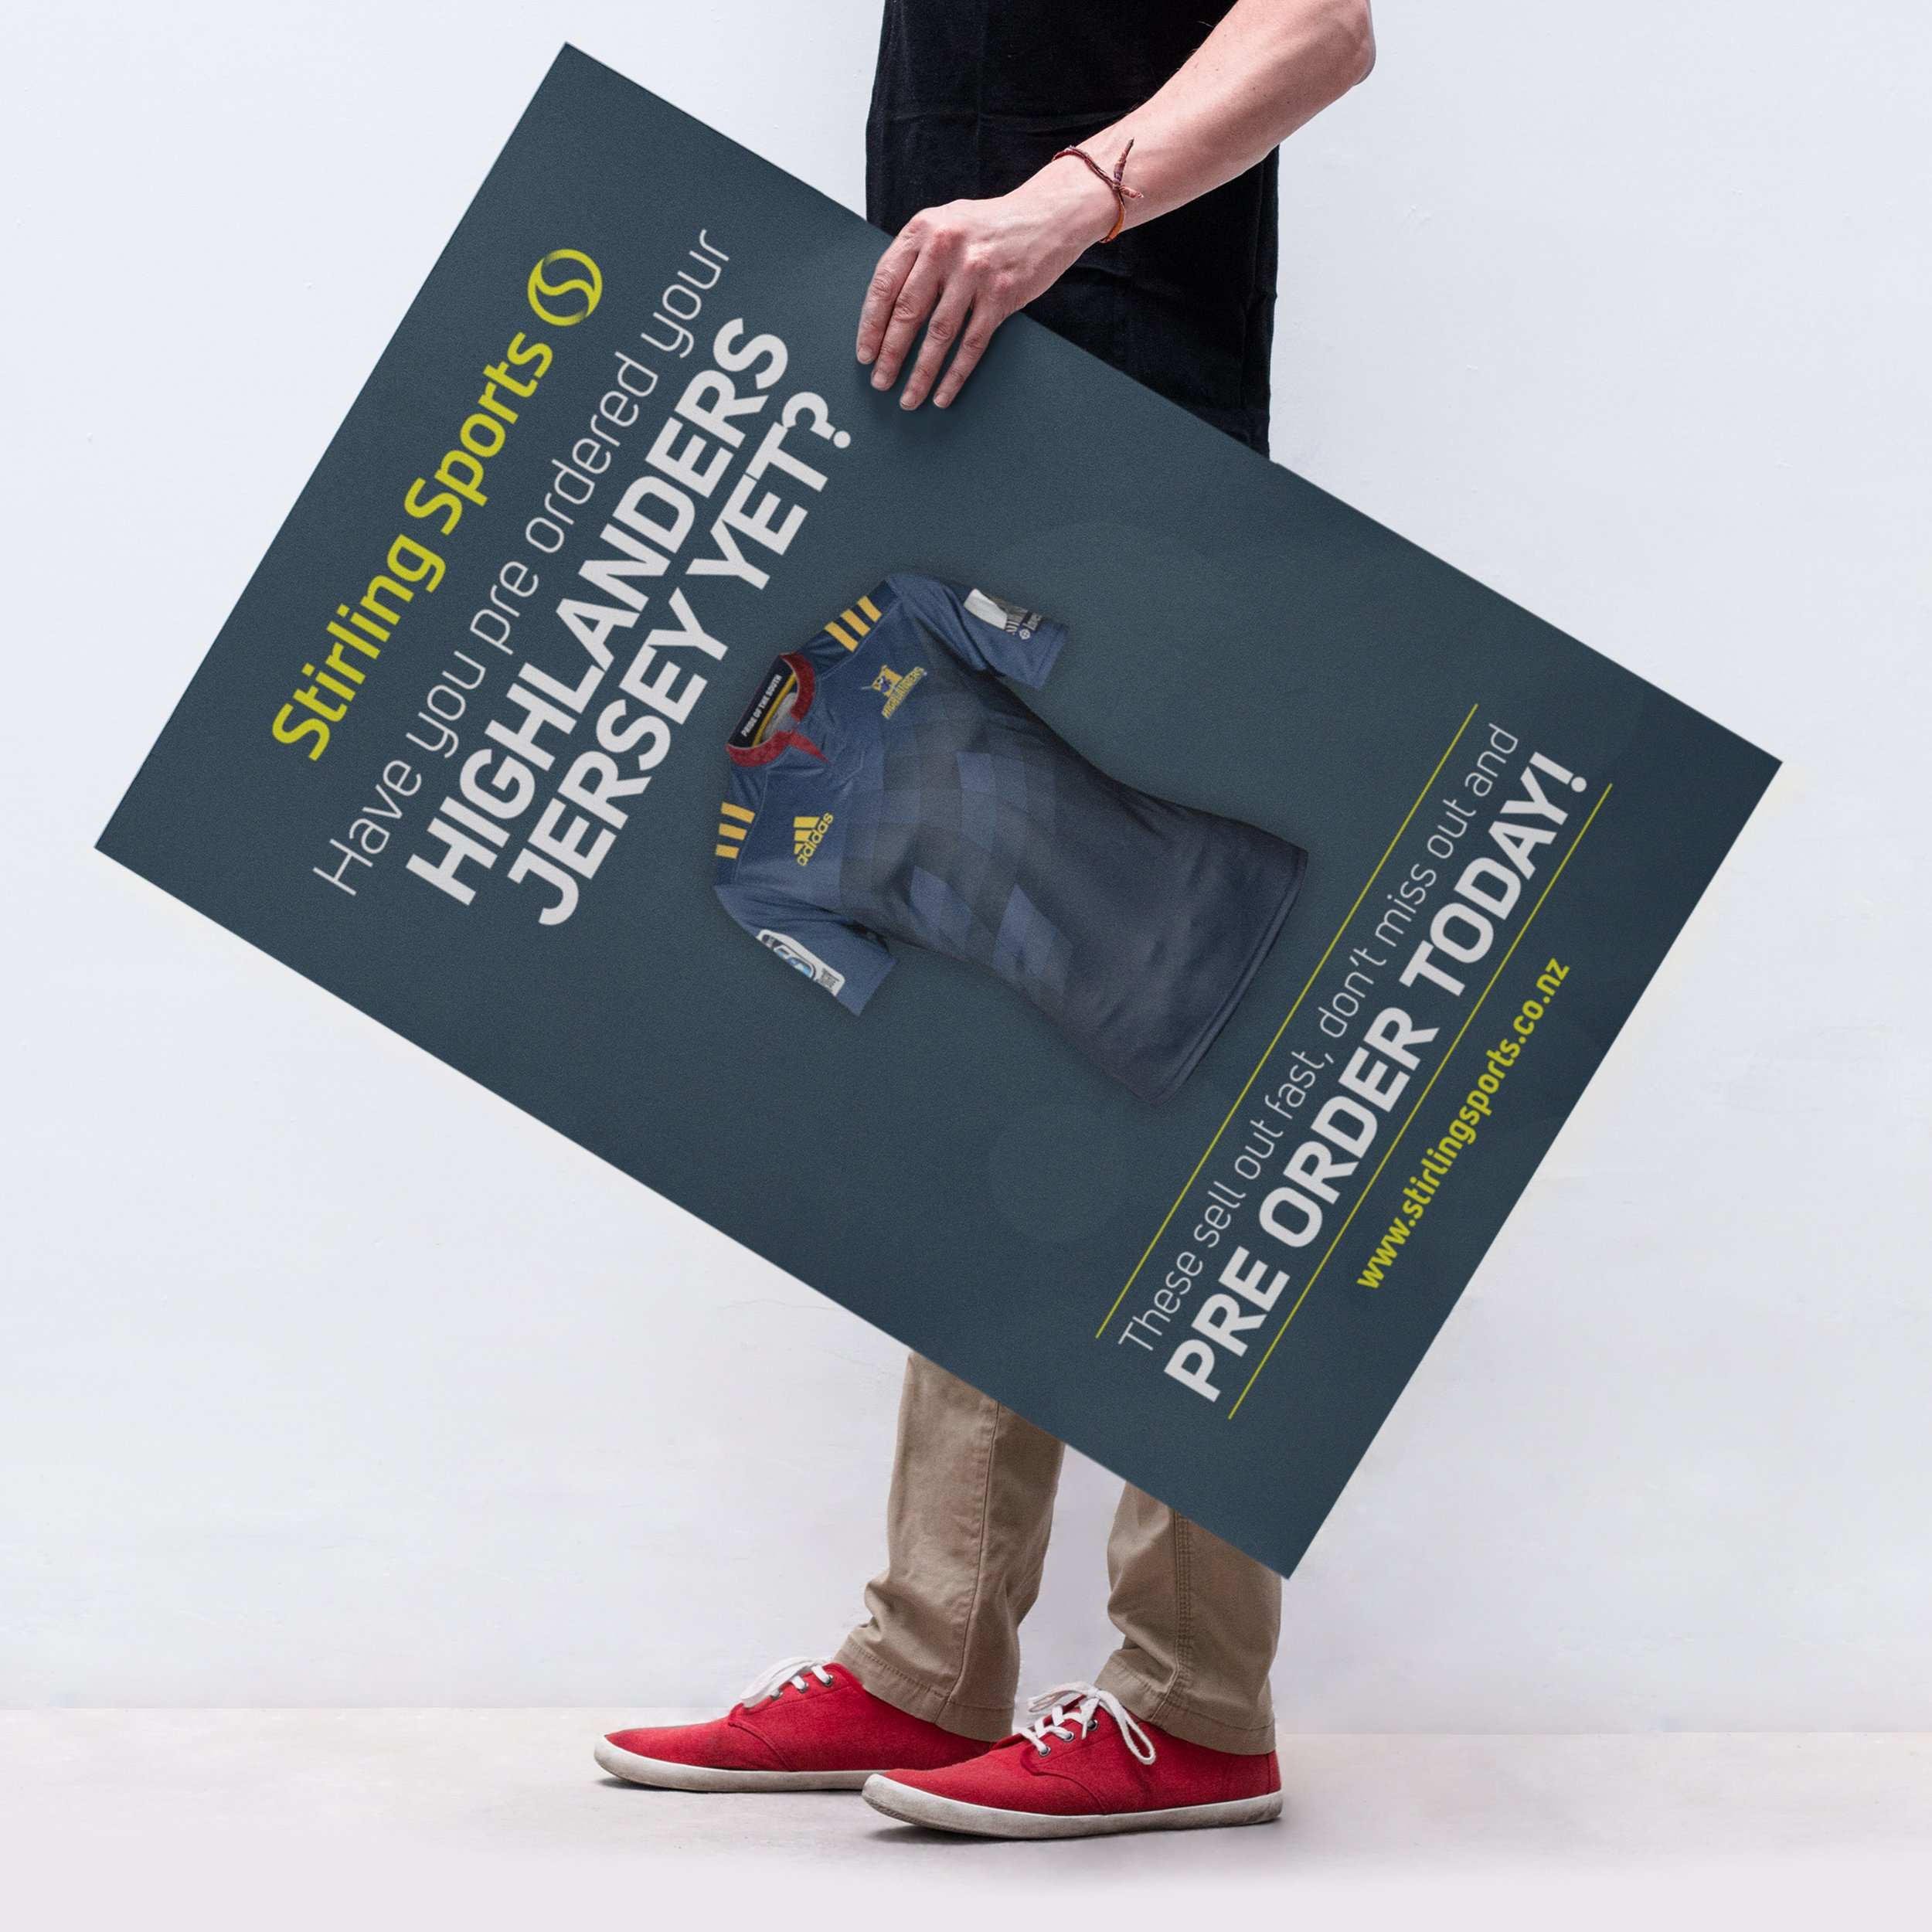 Stirling Sports Poster (square)-min.jpg